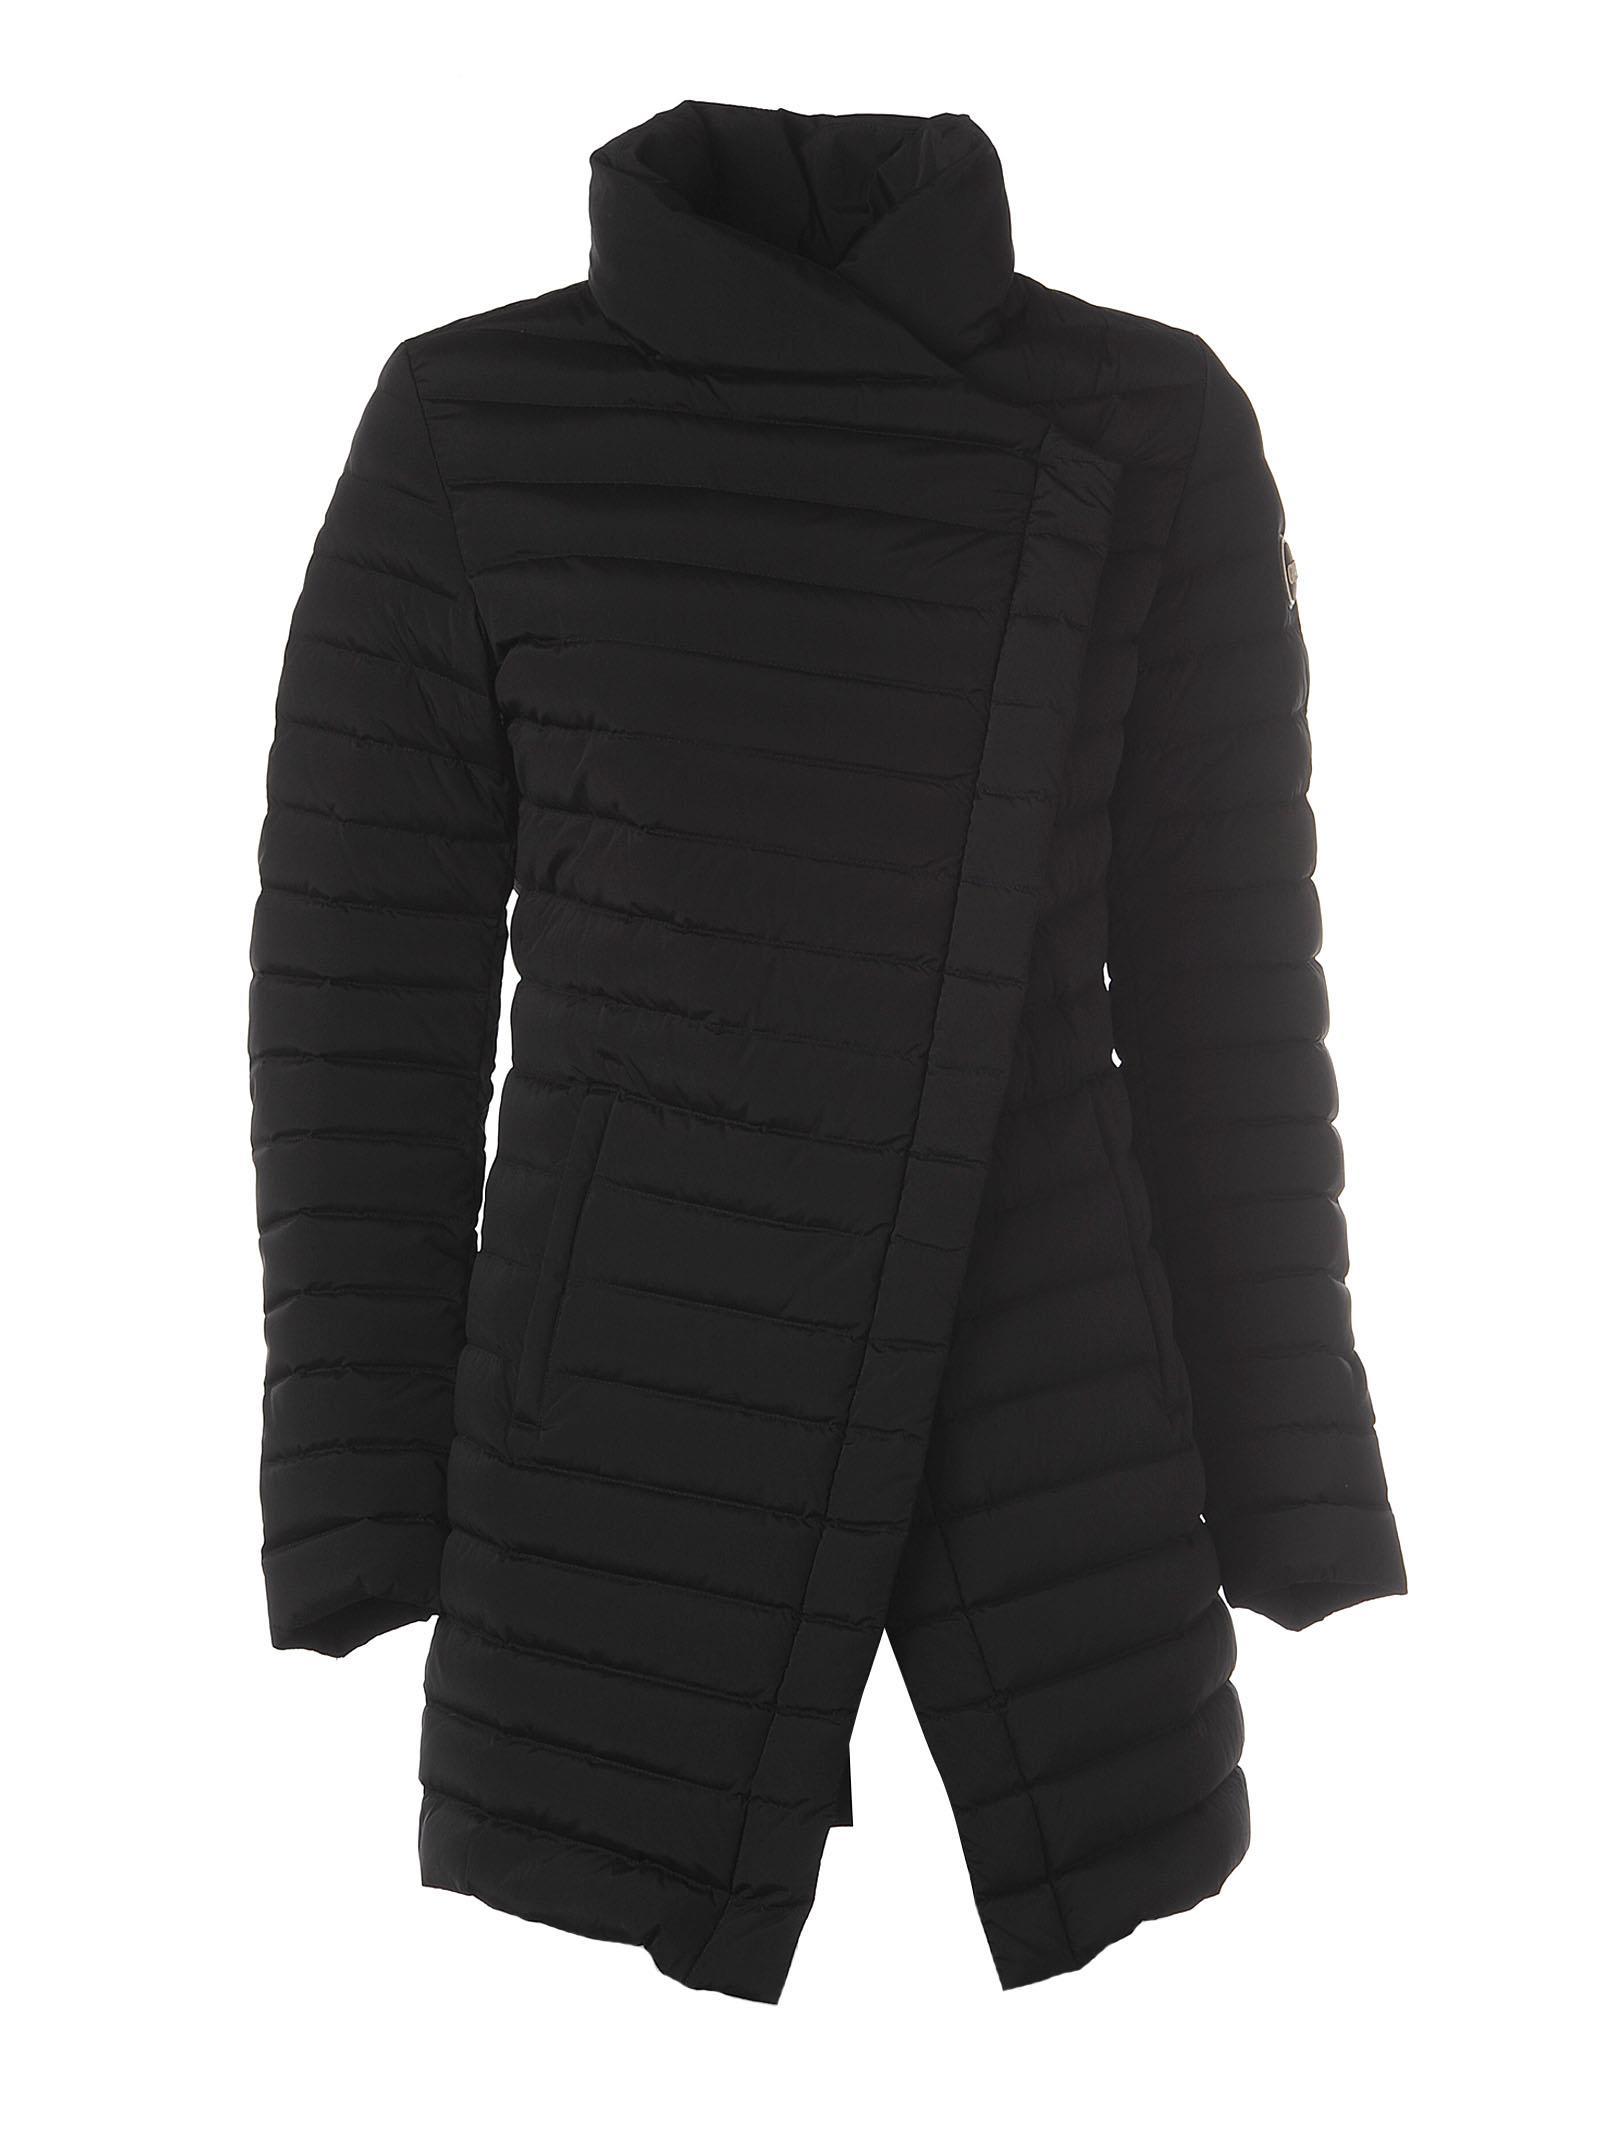 Colmar Black Quilted Jacket